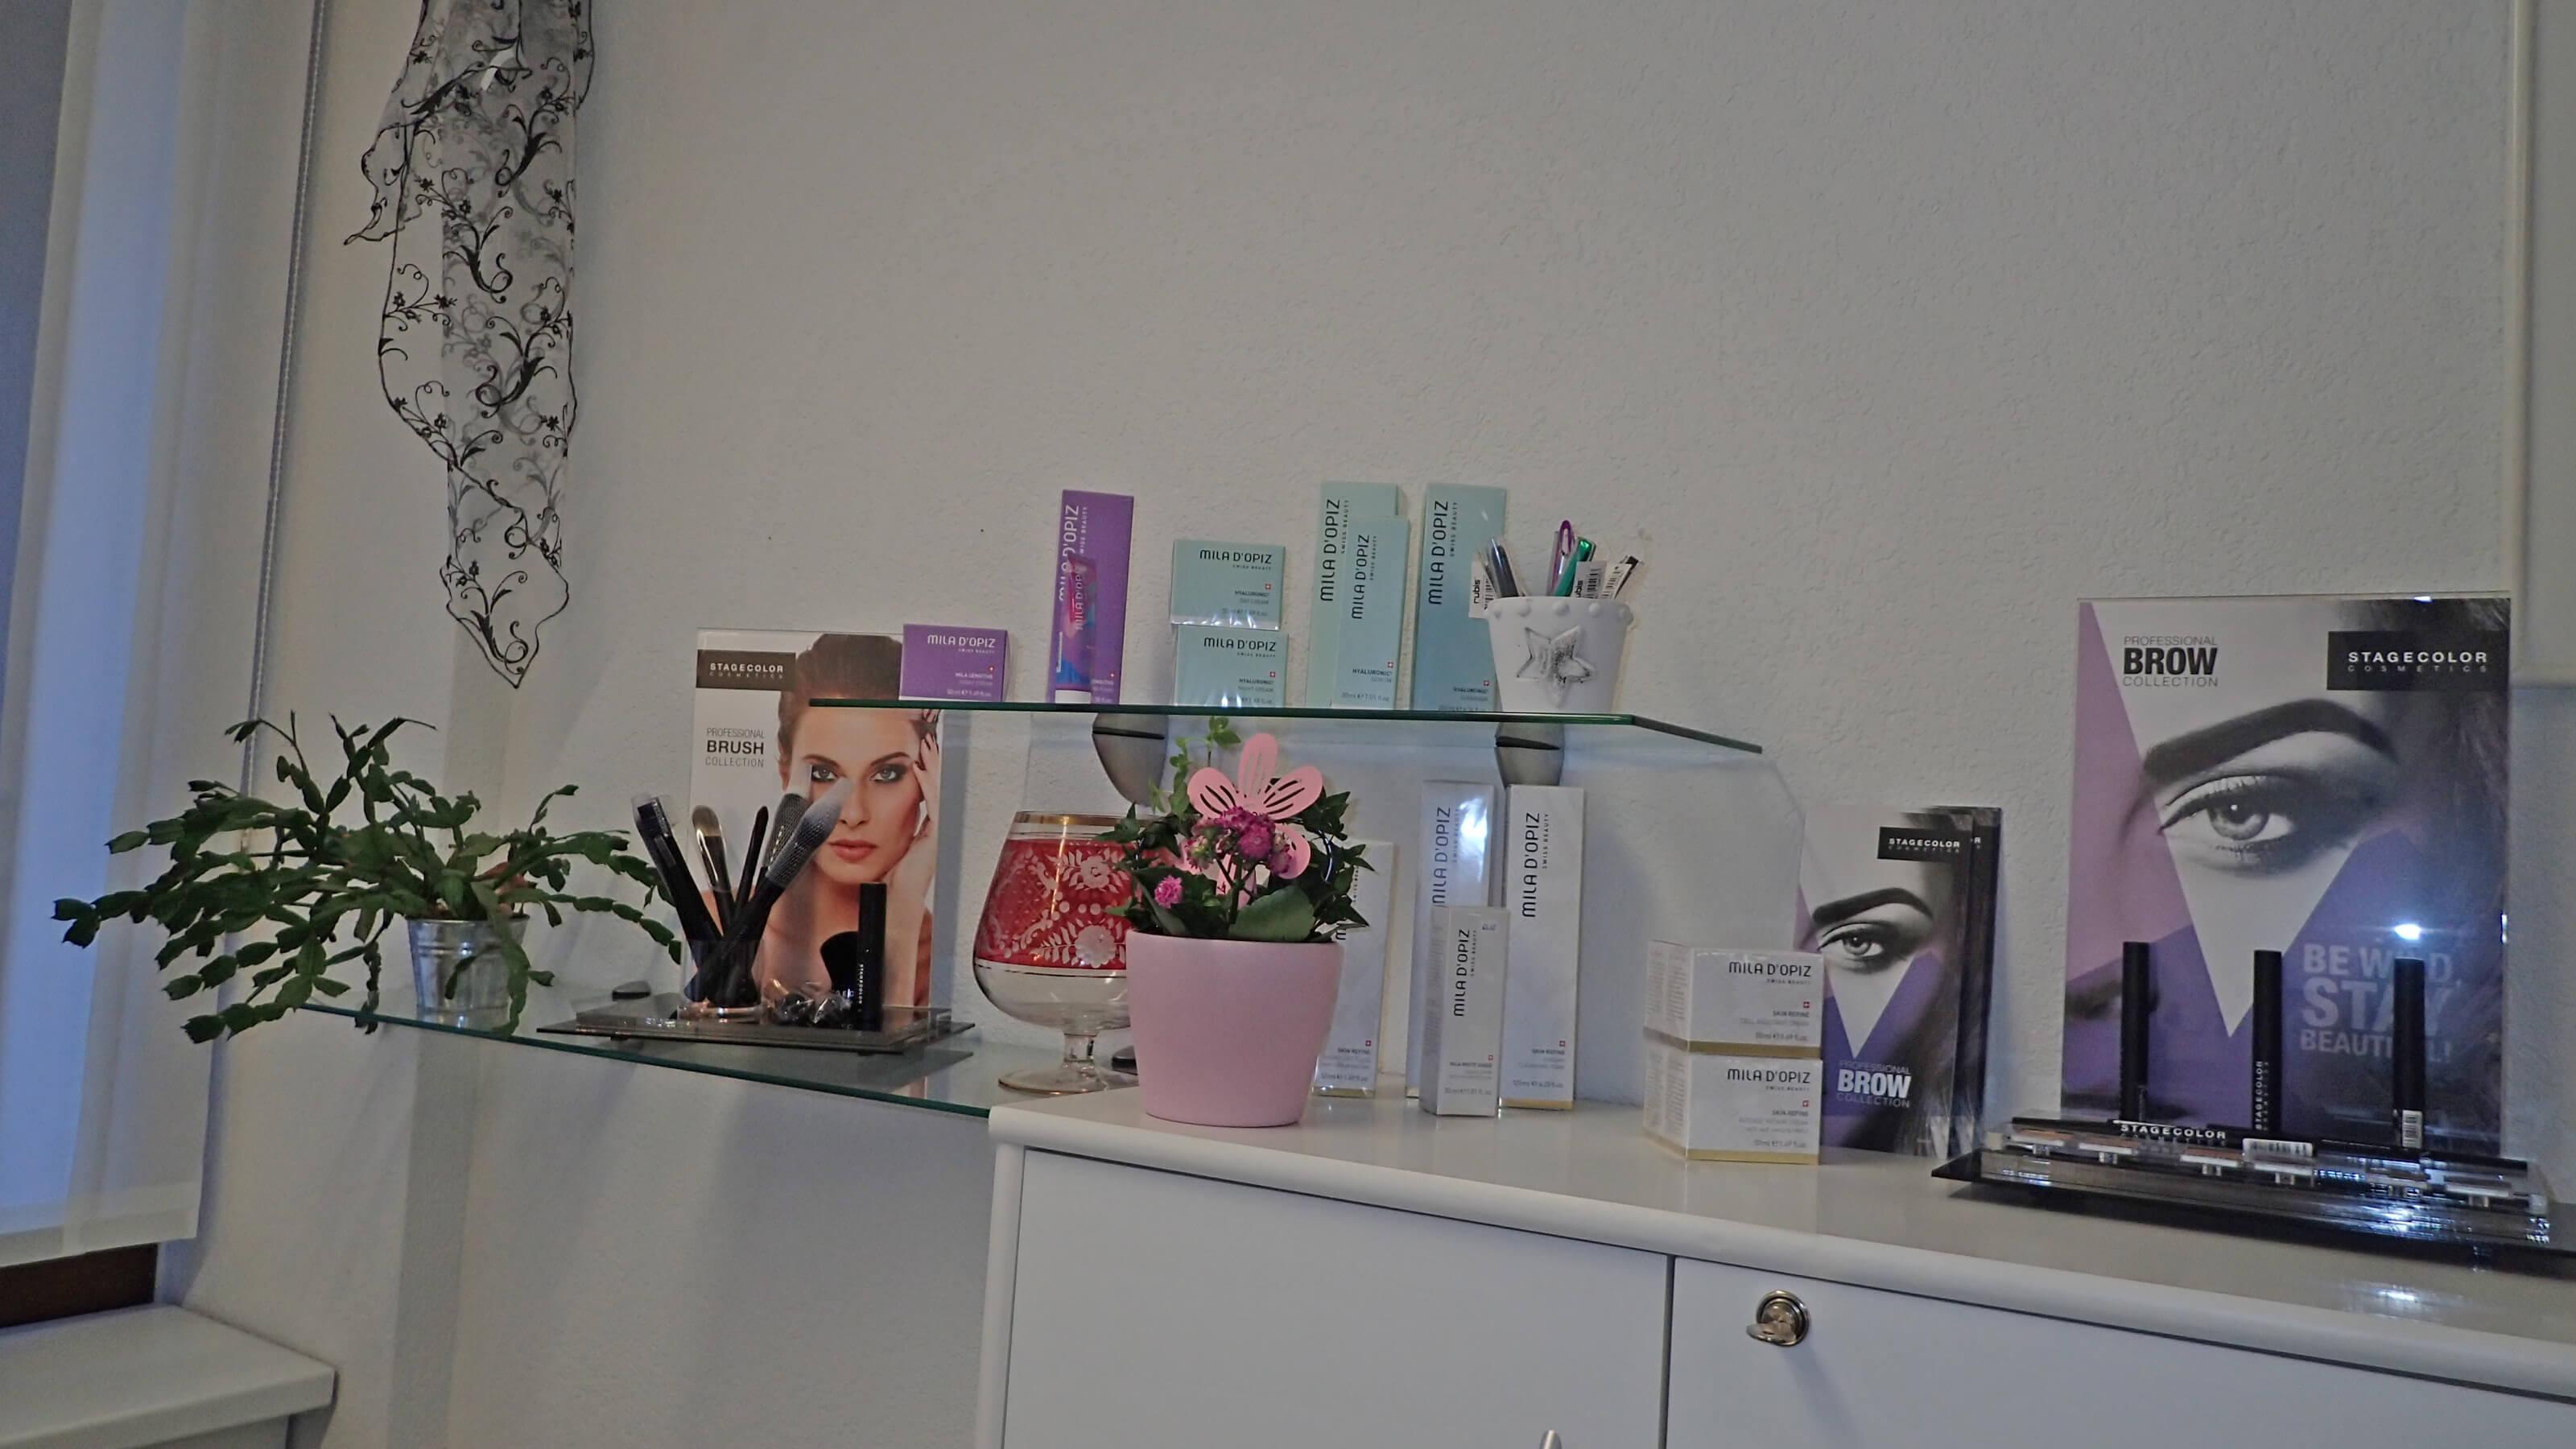 Kosmetikstübli der IG gsund u schön